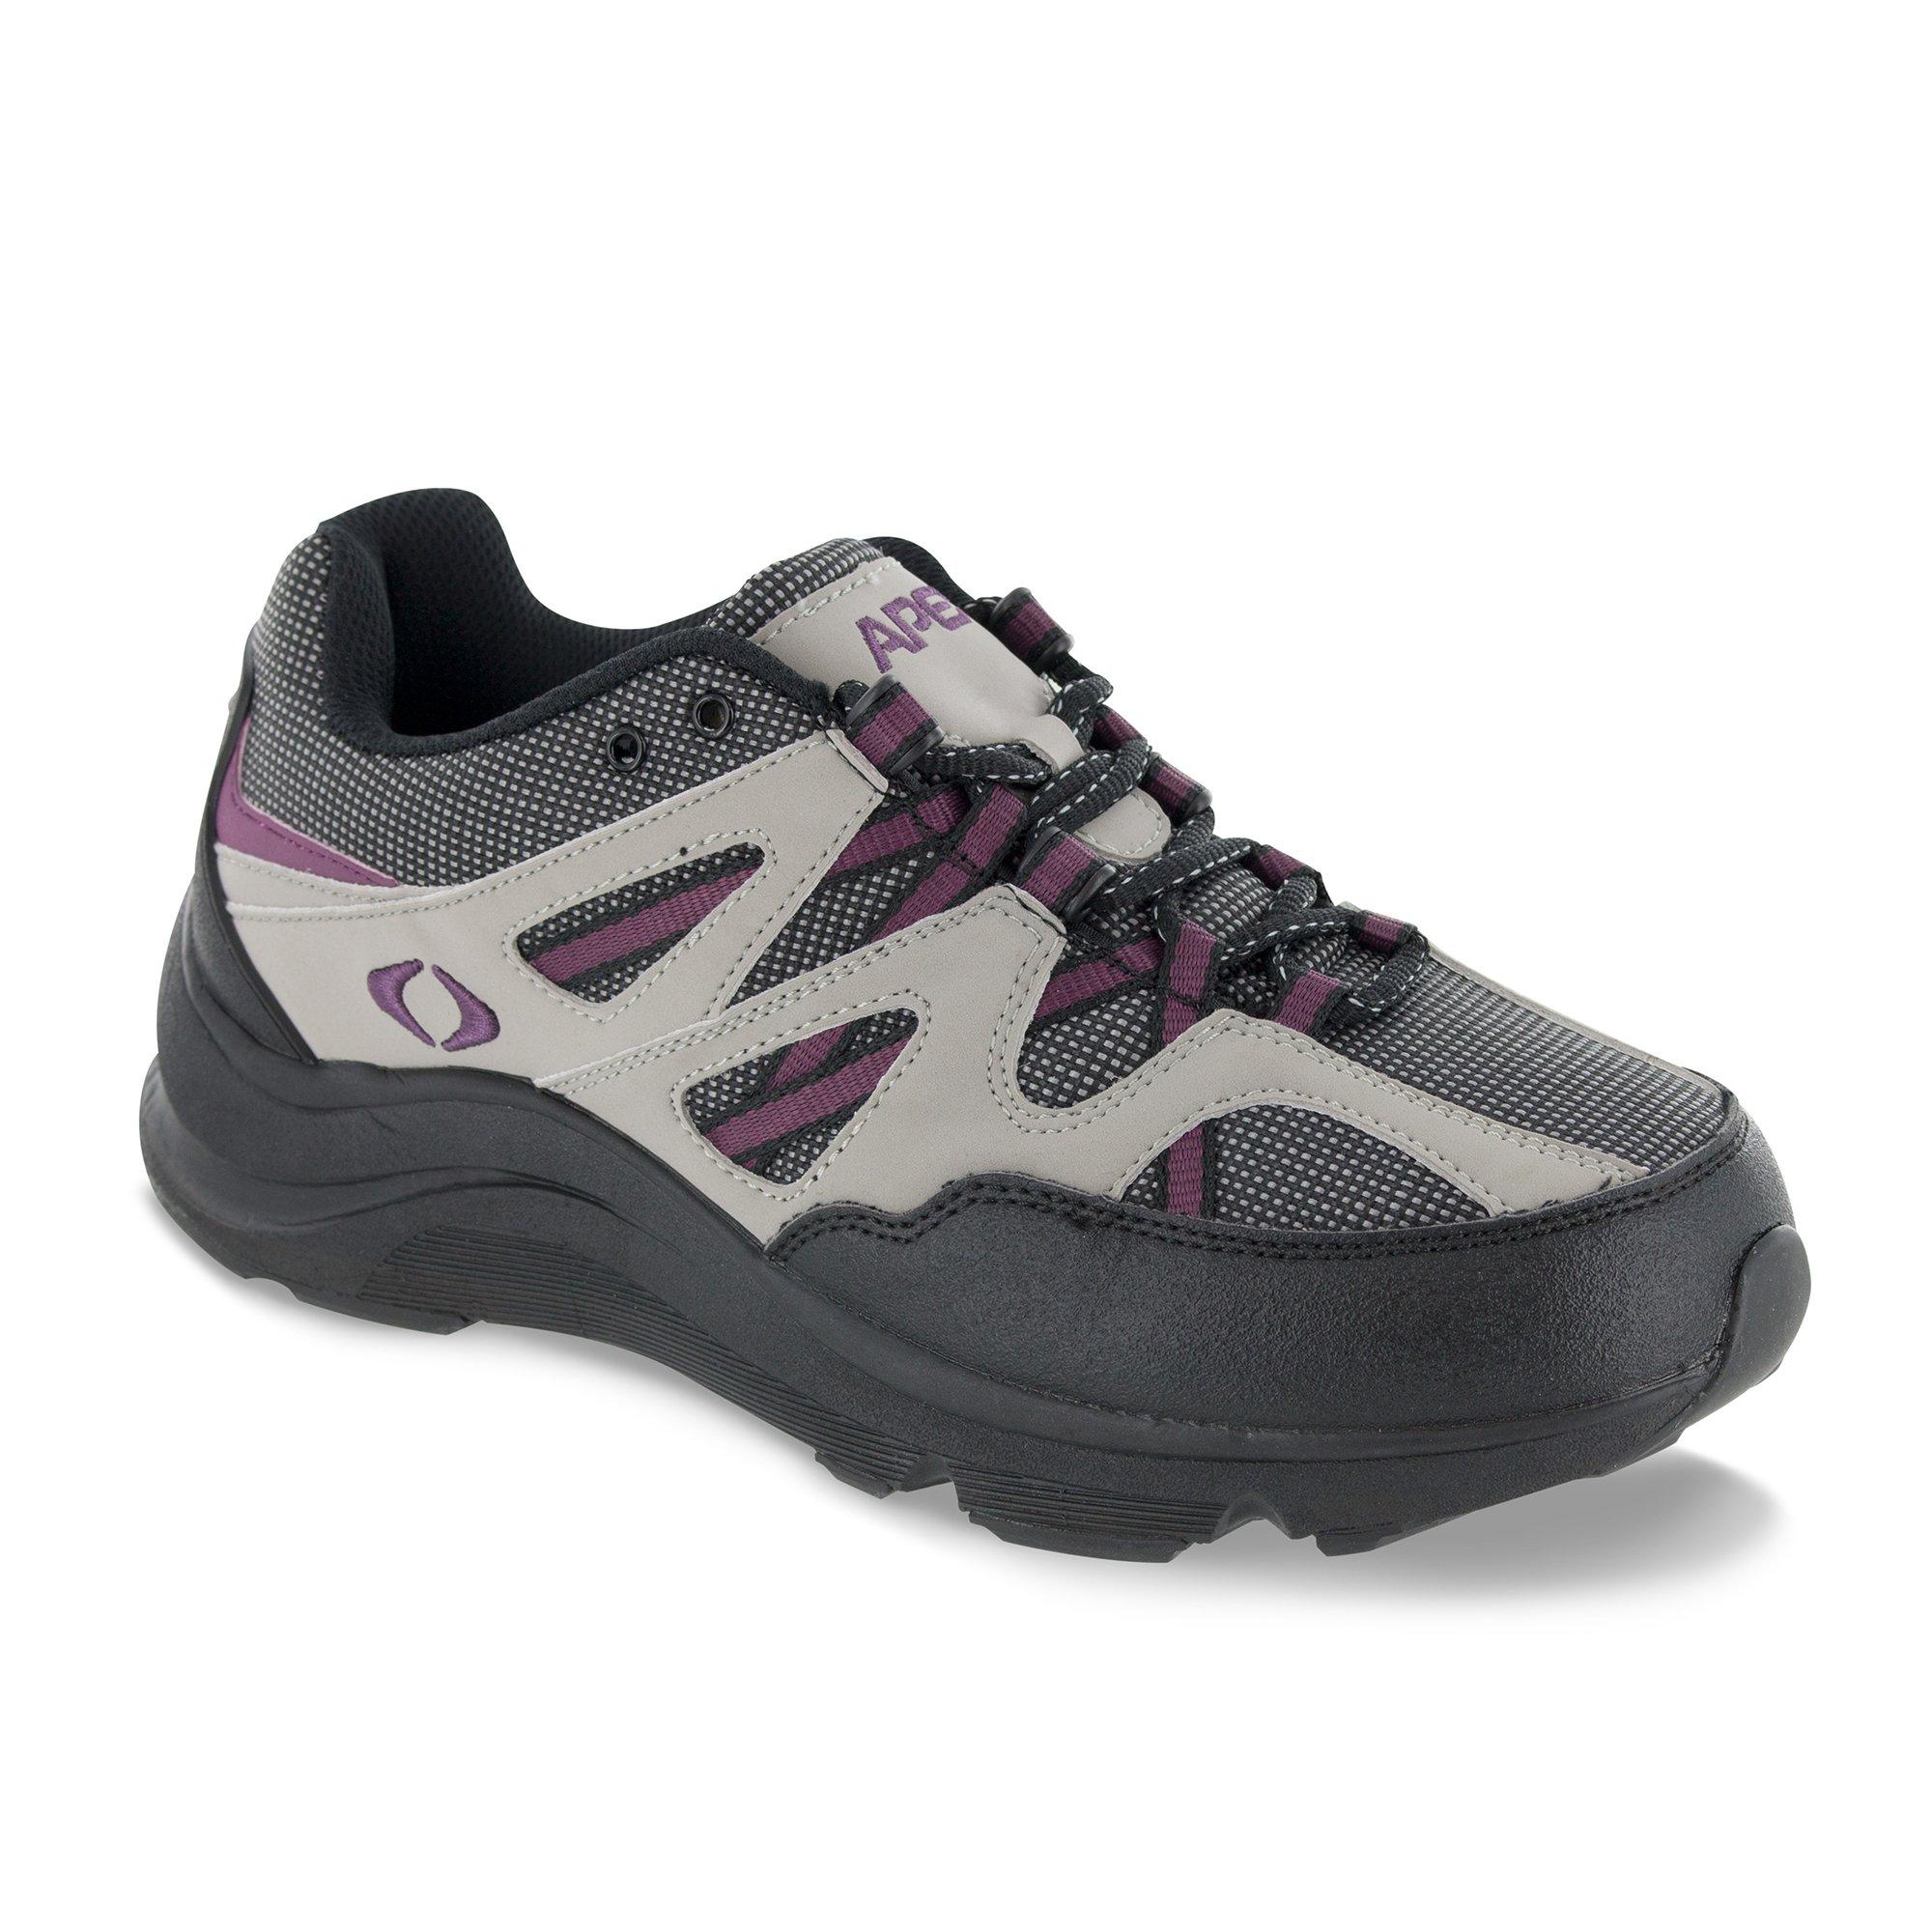 Apex Women's Sierra Trail Running Shoe, Grey, 8 M US